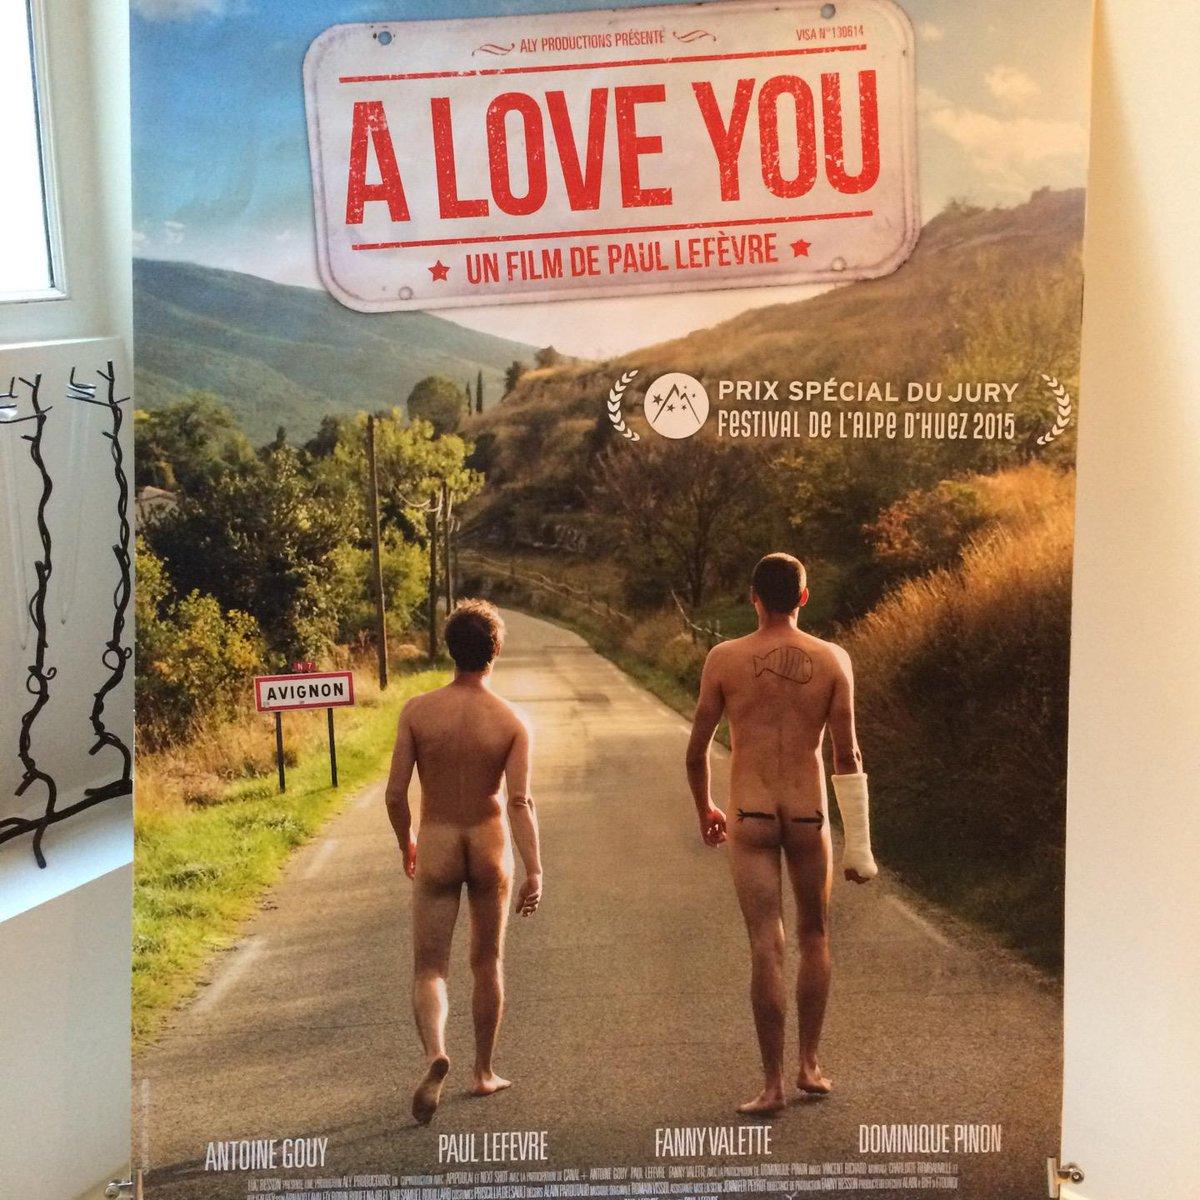 #ALoveYou et toi ? #Cinéma #Blog #SmartGirlsBlog (@ Club Marbeuf in Paris, Île-de-France)  https://www. swarmapp.com/c/jZomVY7Hy2f    pic.twitter.com/XwCFDrzsIu